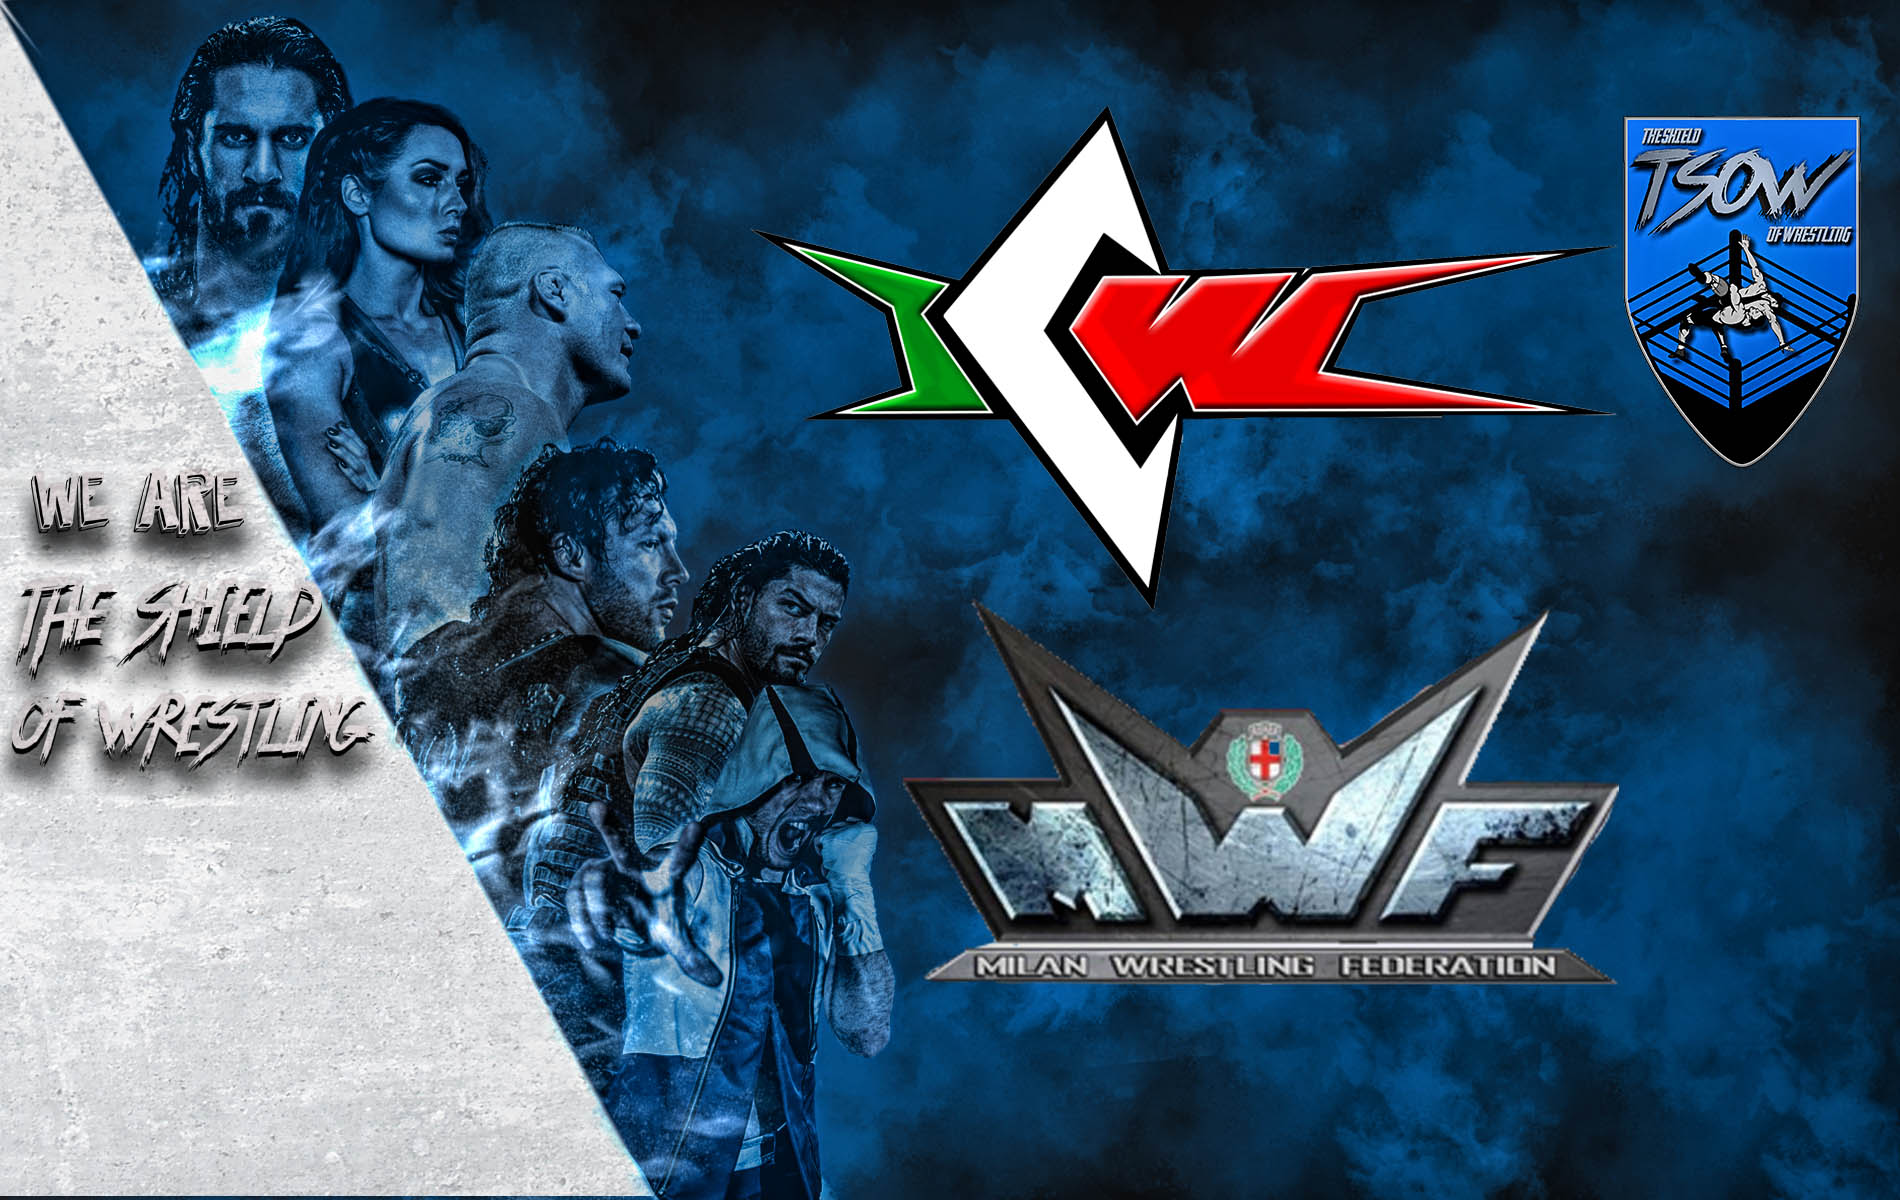 MWF vs ICW